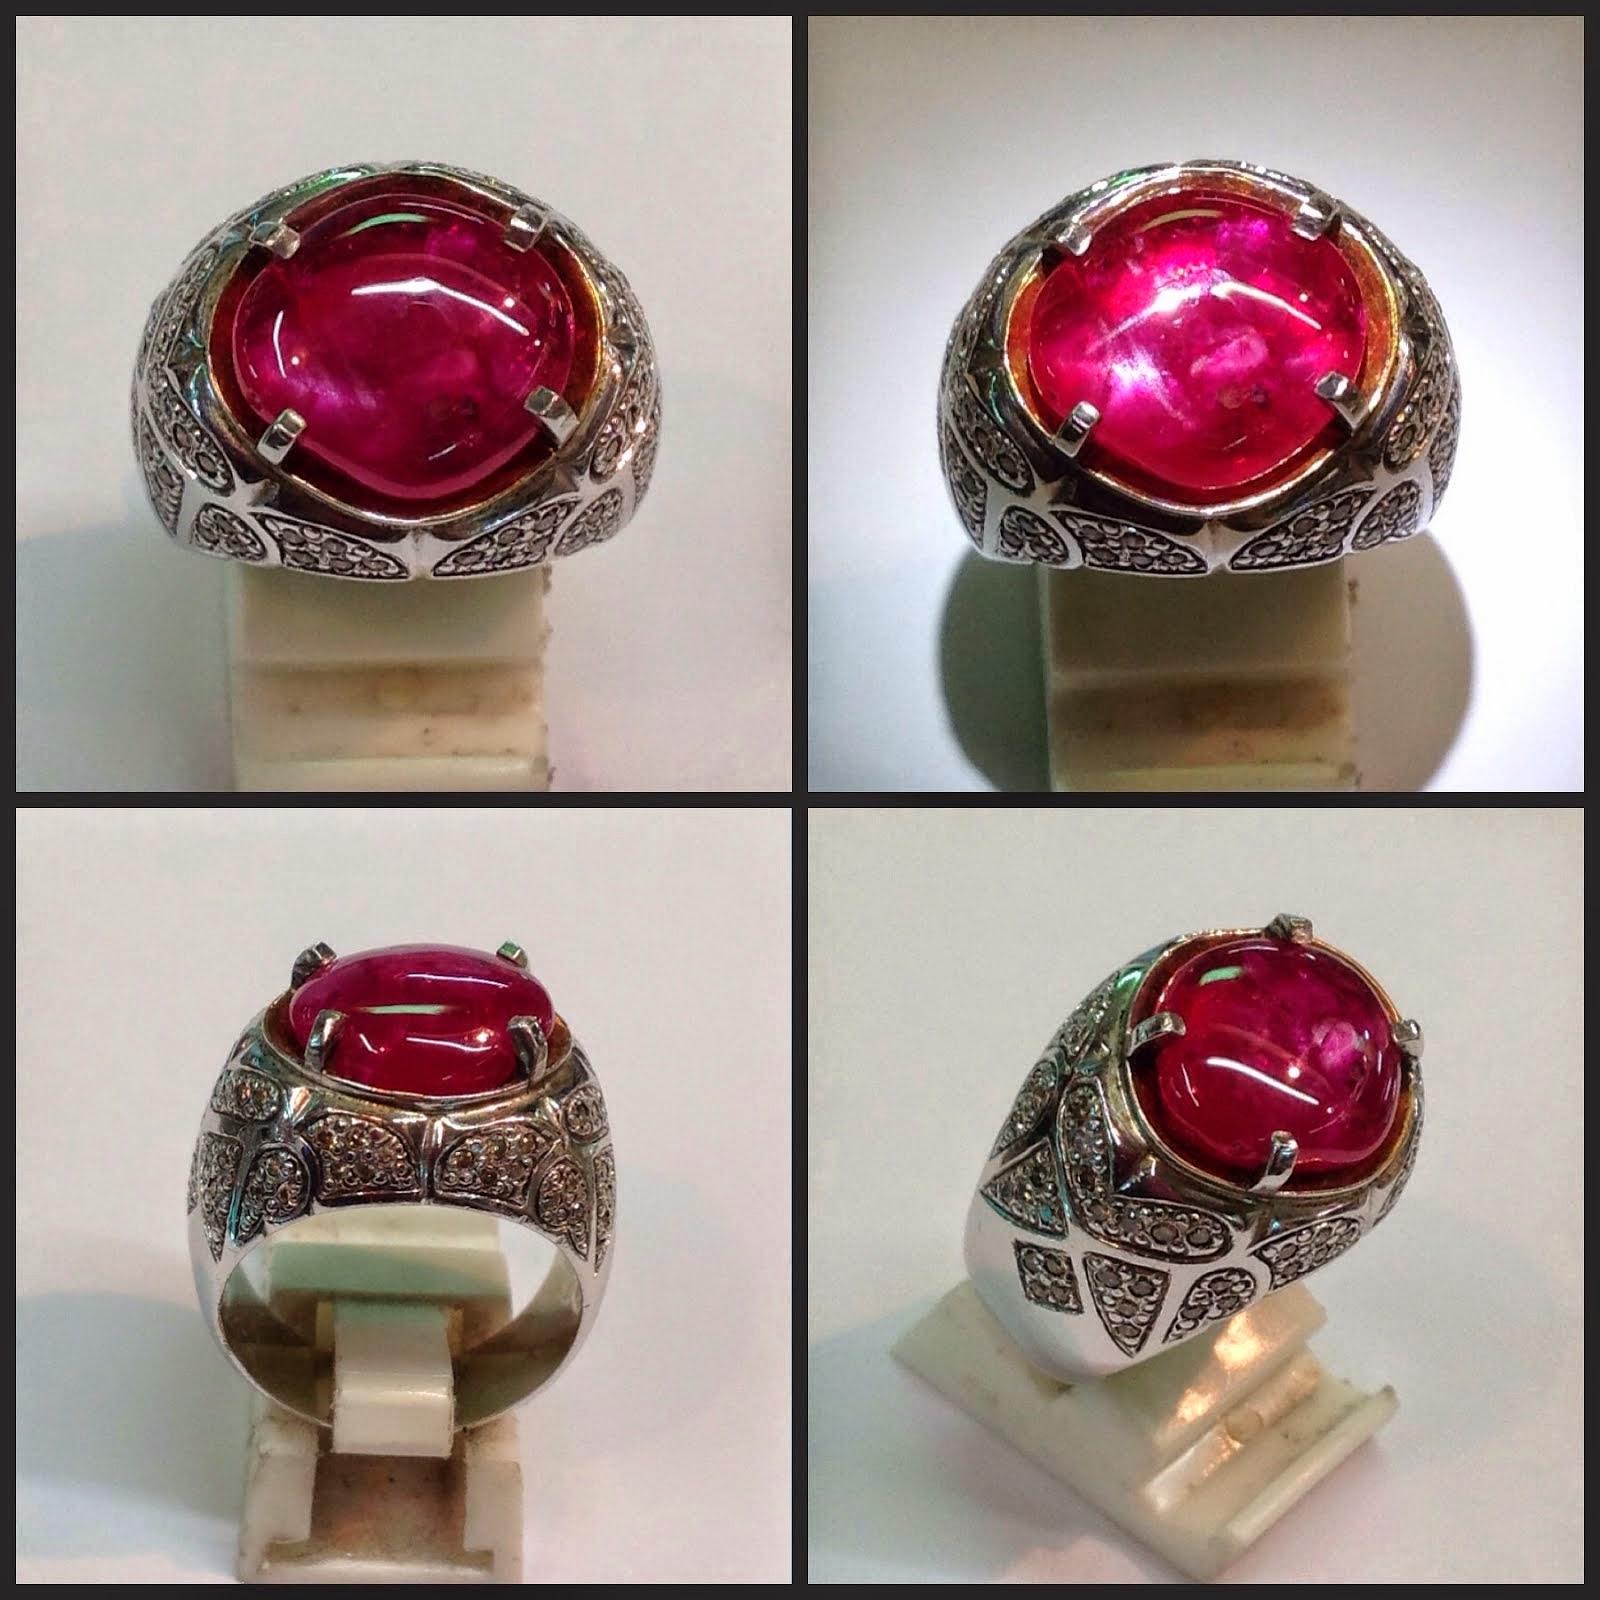 Cincin star ruby (TB0120) (Rp.45.000.000) nett